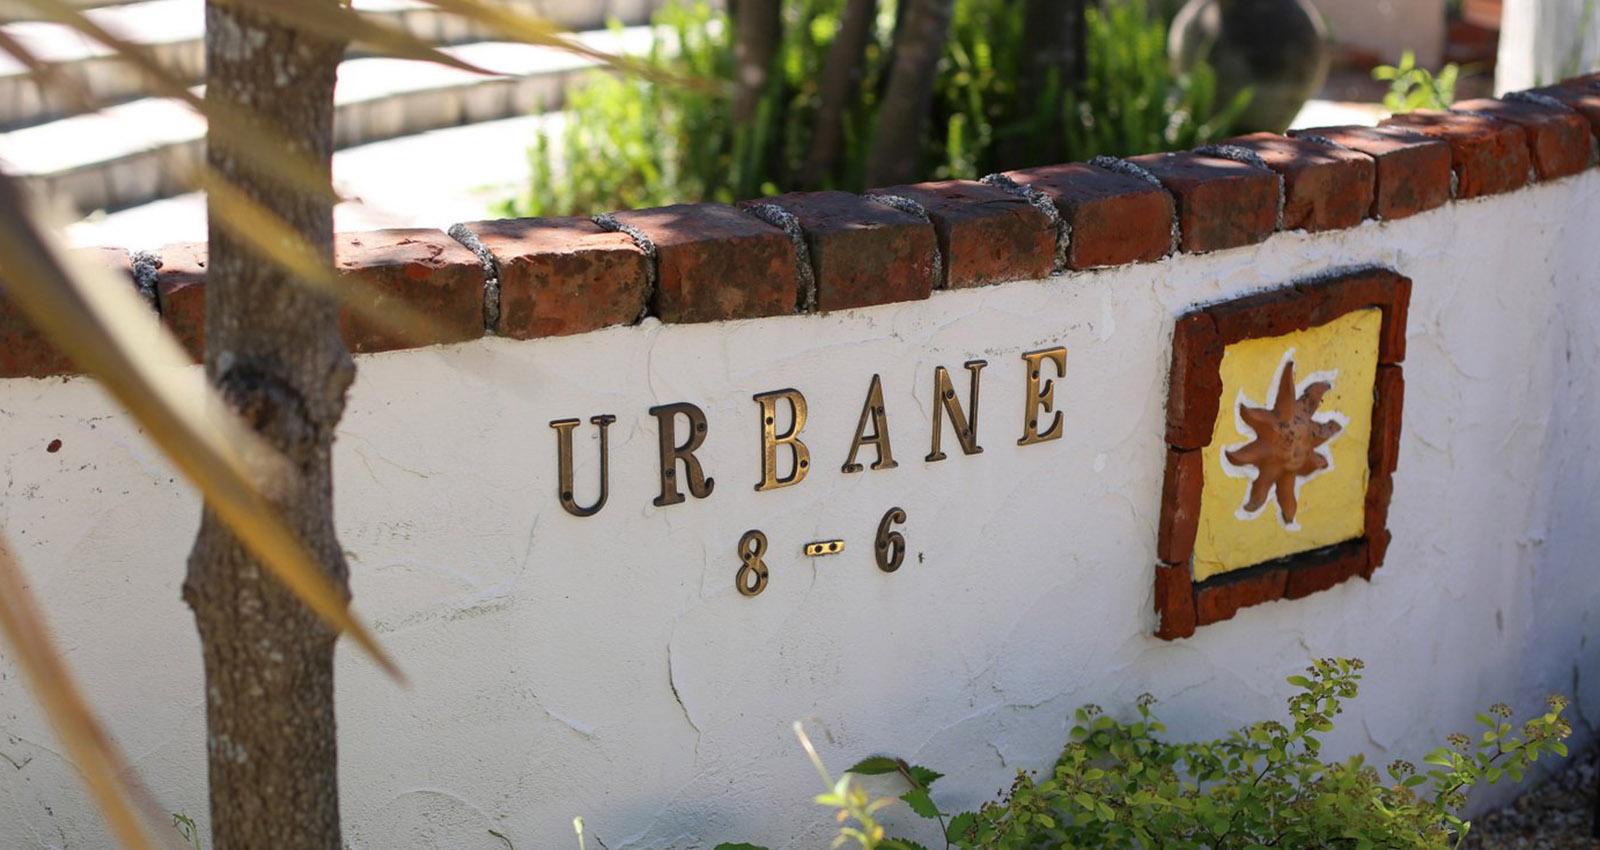 UEBANE(アーベイン)外構|庭造り|三重県津市|会社概要